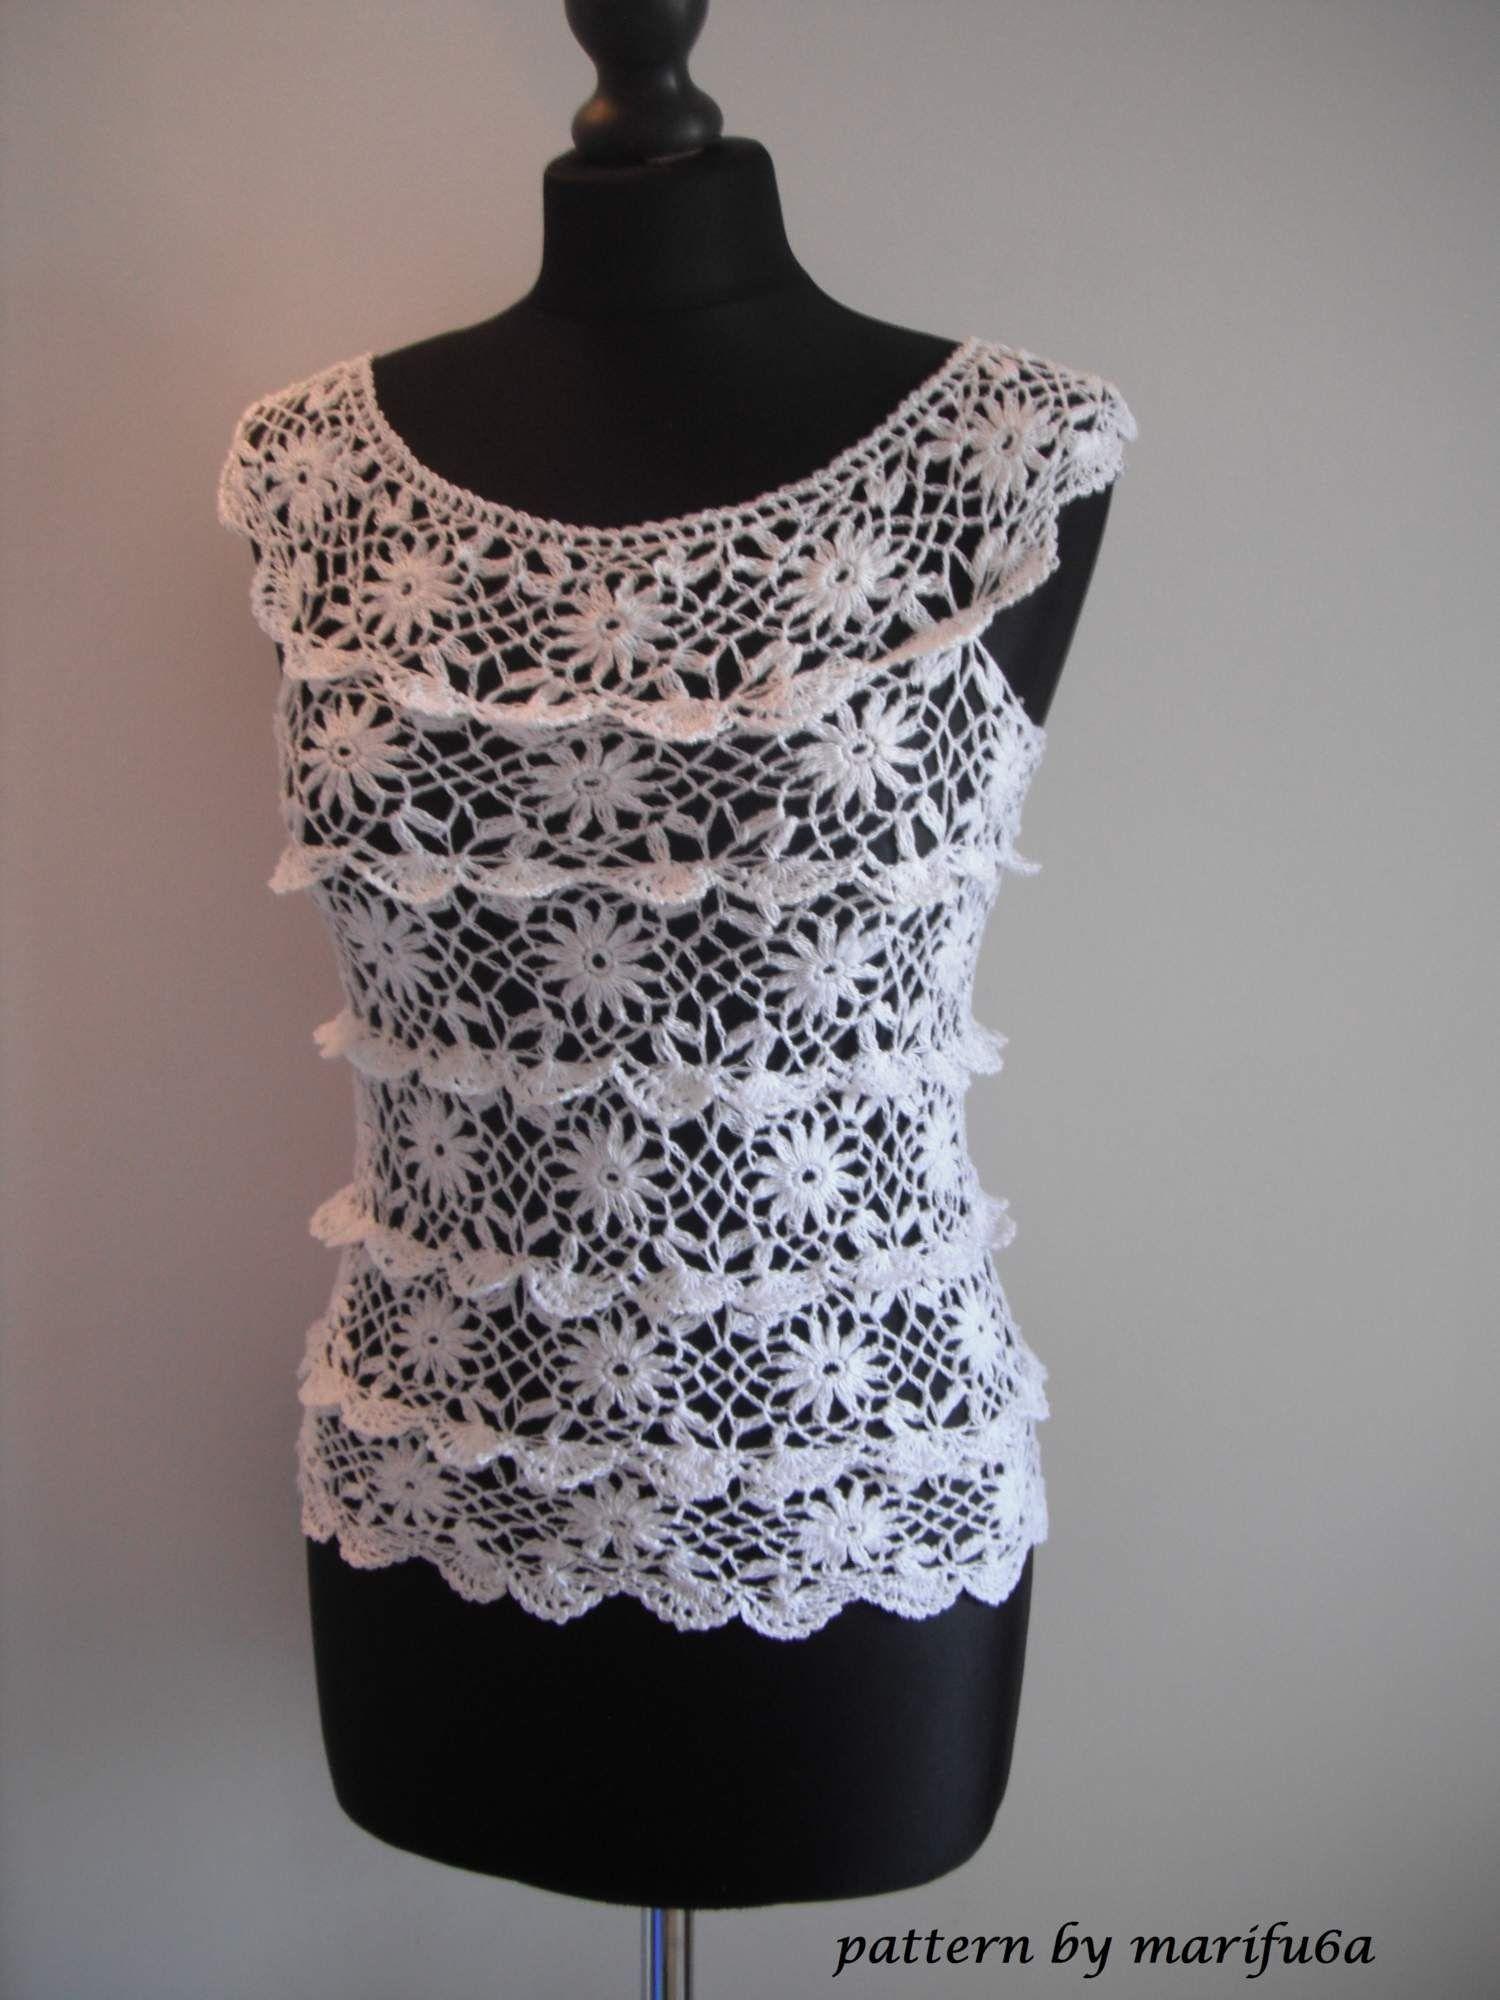 How to crochet ruffle blouse by marifu6a free crochet pattern how to crochet ruffle blouse by marifu6a free crochet pattern tutorial bankloansurffo Gallery